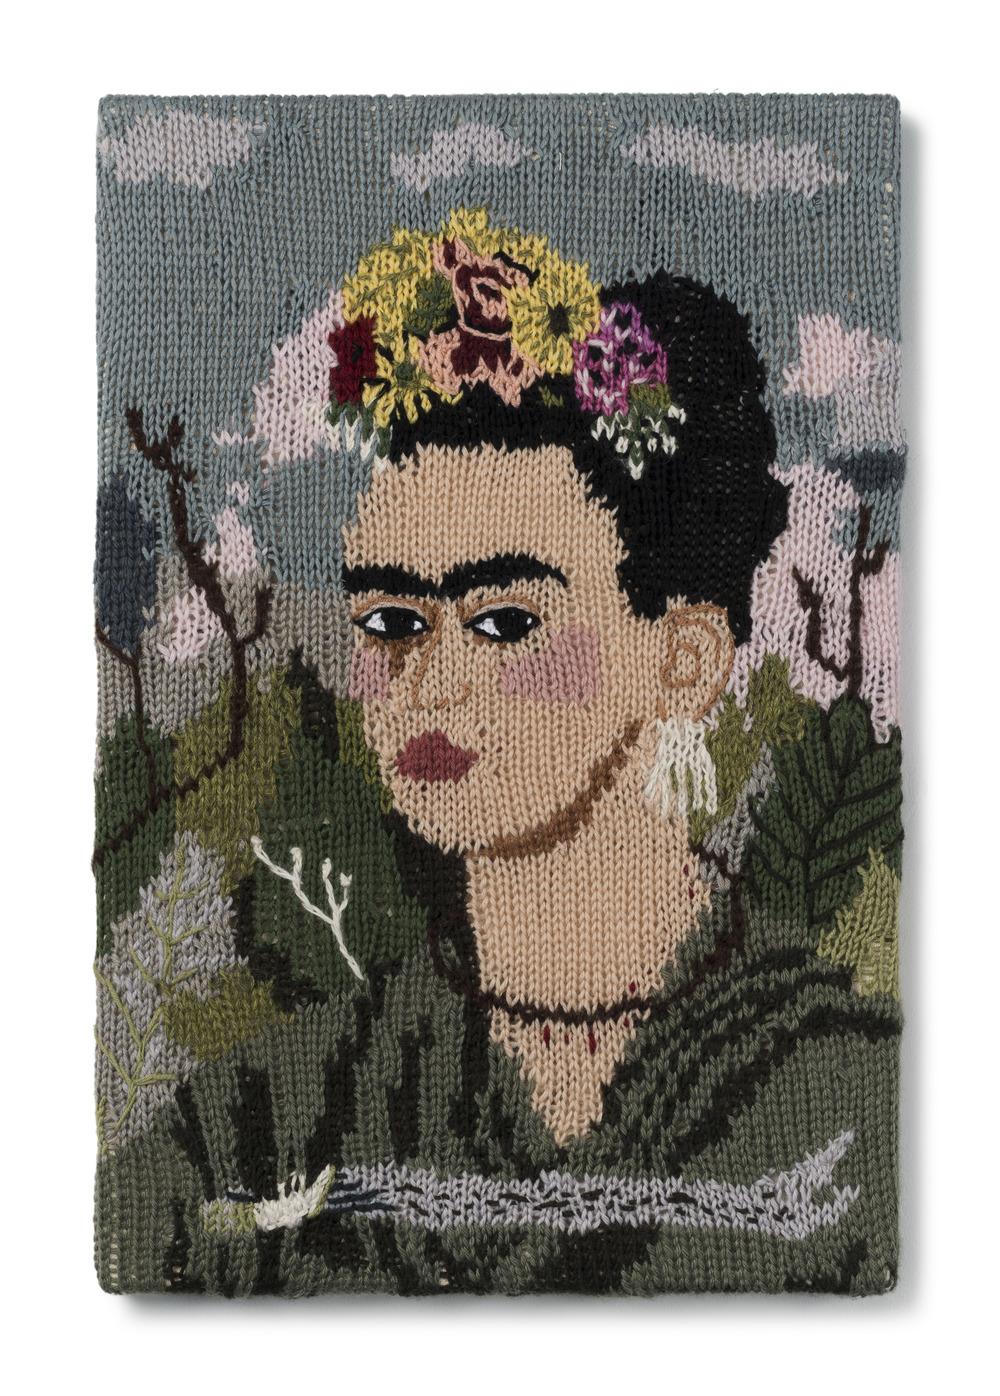 "Feminist Fan #14 (Frida Kahlo Self Portrait: 1940), 2015        Normal   0           false   false   false     EN-AU   JA   X-NONE                                                                                                                                                                                                                                                                                                                                                                           /* Style Definitions */  table.MsoNormalTable {mso-style-name:""Table Normal""; mso-tstyle-rowband-size:0; mso-tstyle-colband-size:0; mso-style-noshow:yes; mso-style-priority:99; mso-style-parent:""""; mso-padding-alt:0in 5.4pt 0in 5.4pt; mso-para-margin-top:0in; mso-para-margin-right:0in; mso-para-margin-bottom:10.0pt; mso-para-margin-left:0in; line-height:115%; mso-pagination:widow-orphan; font-size:11.0pt; font-family:""Calibri"",""sans-serif""; mso-ascii-font-family:Calibri; mso-ascii-theme-font:minor-latin; mso-hansi-font-family:Calibri; mso-hansi-theme-font:minor-latin; mso-fareast-language:EN-US;}"